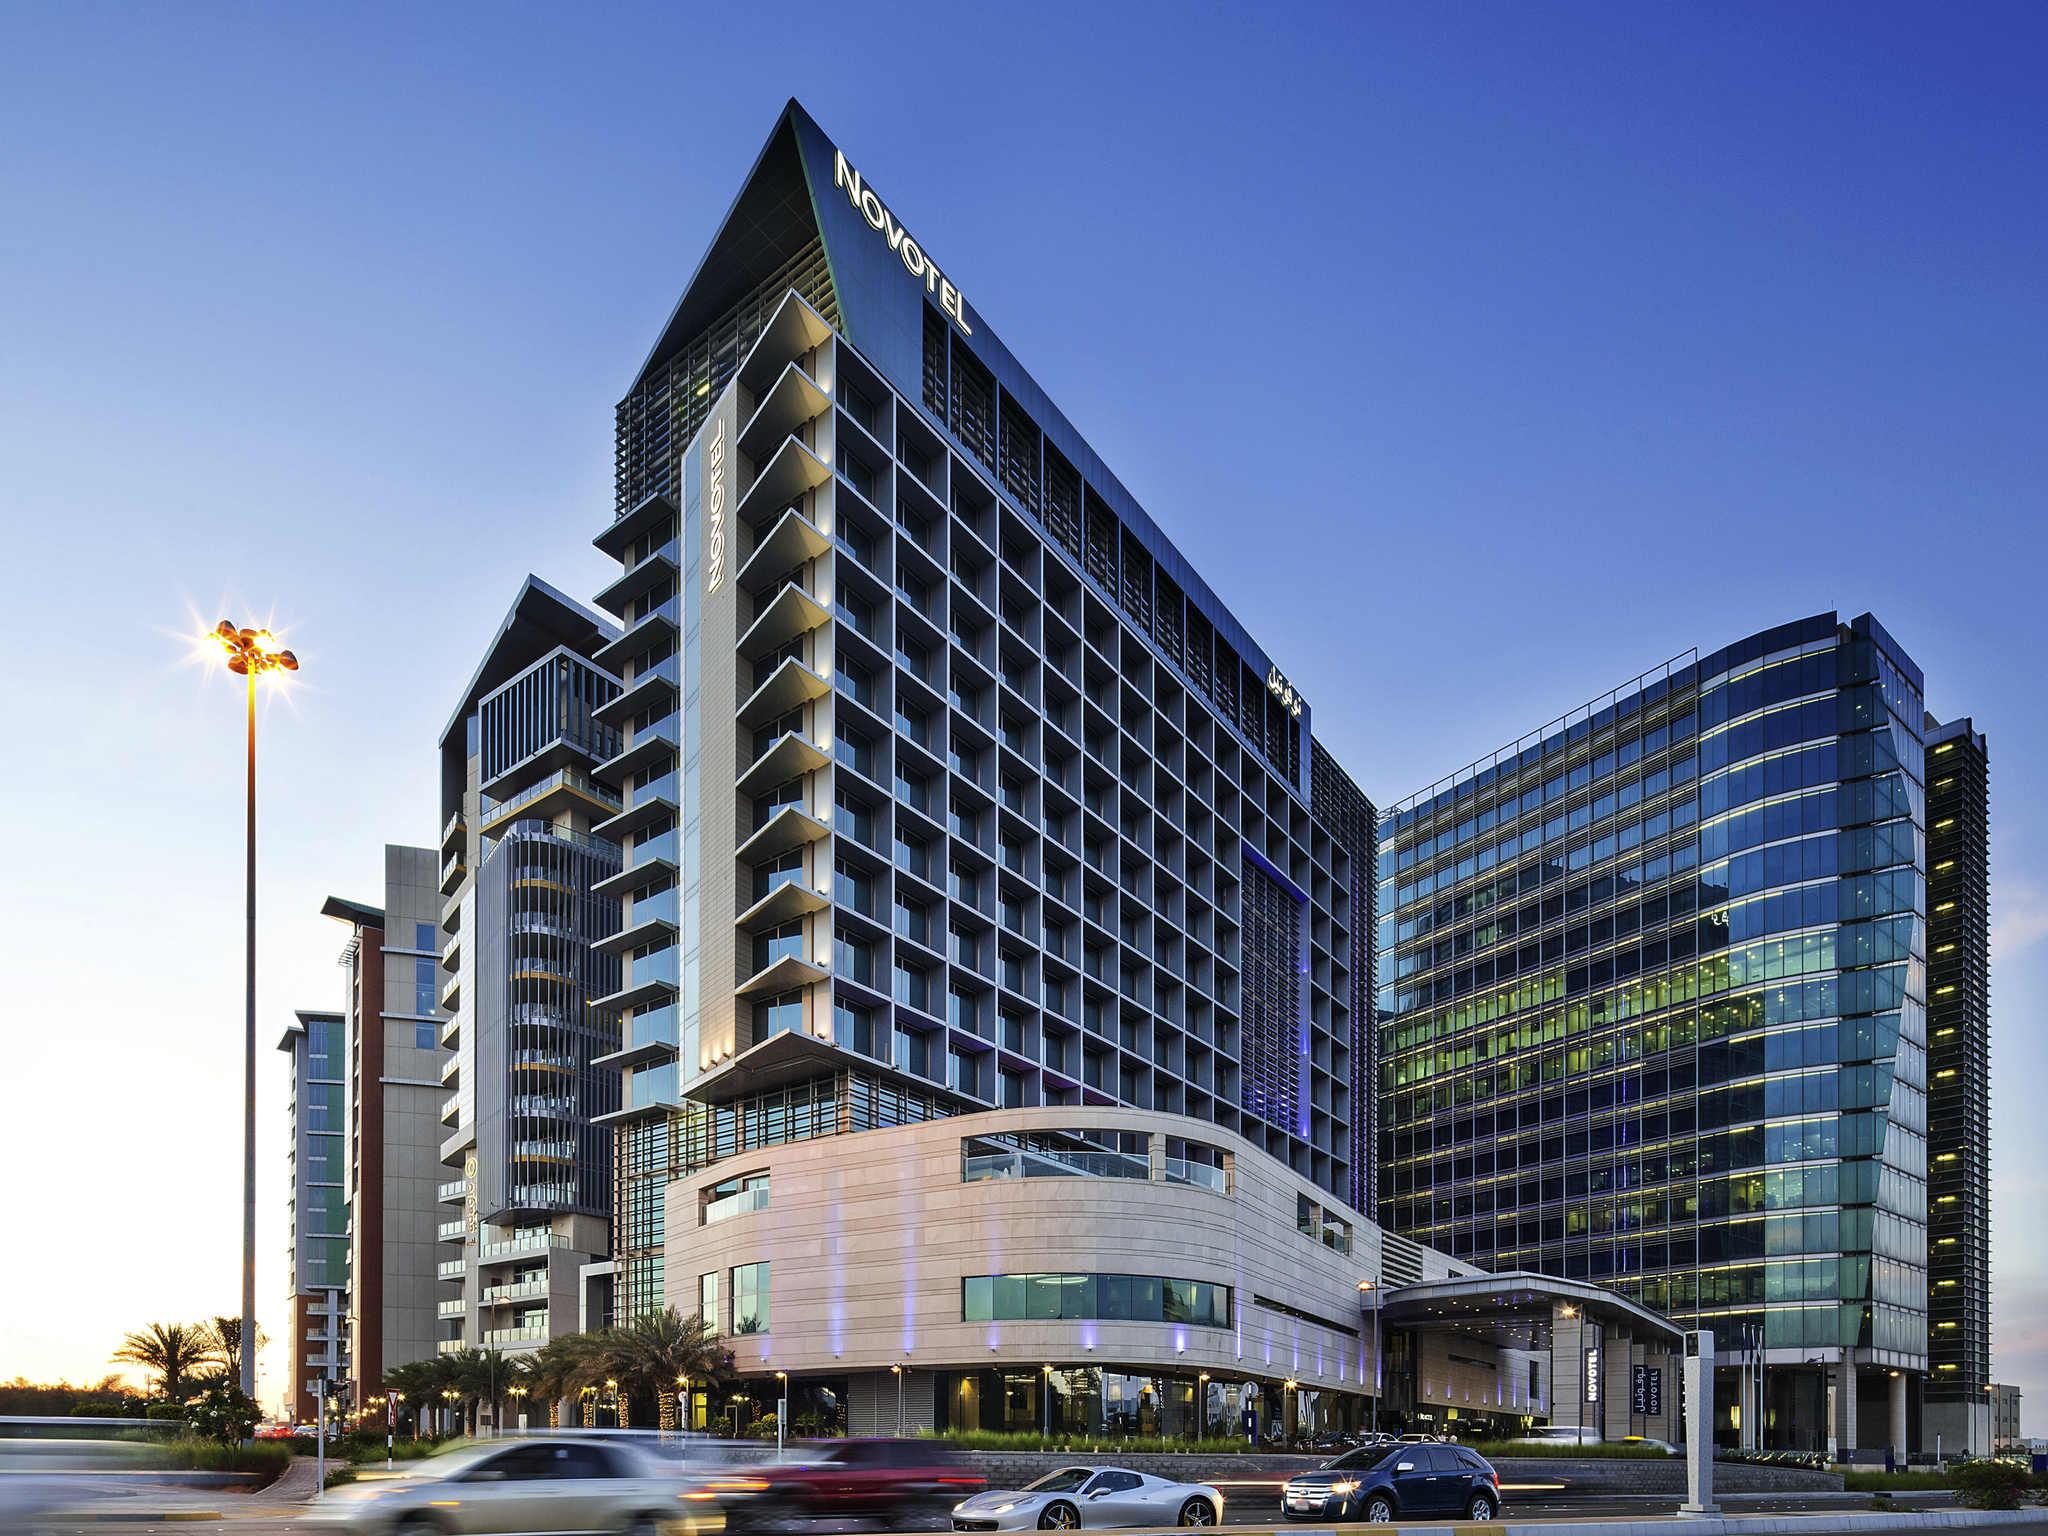 فندق - نوفوتيل Novotel أبو ظبي البستان